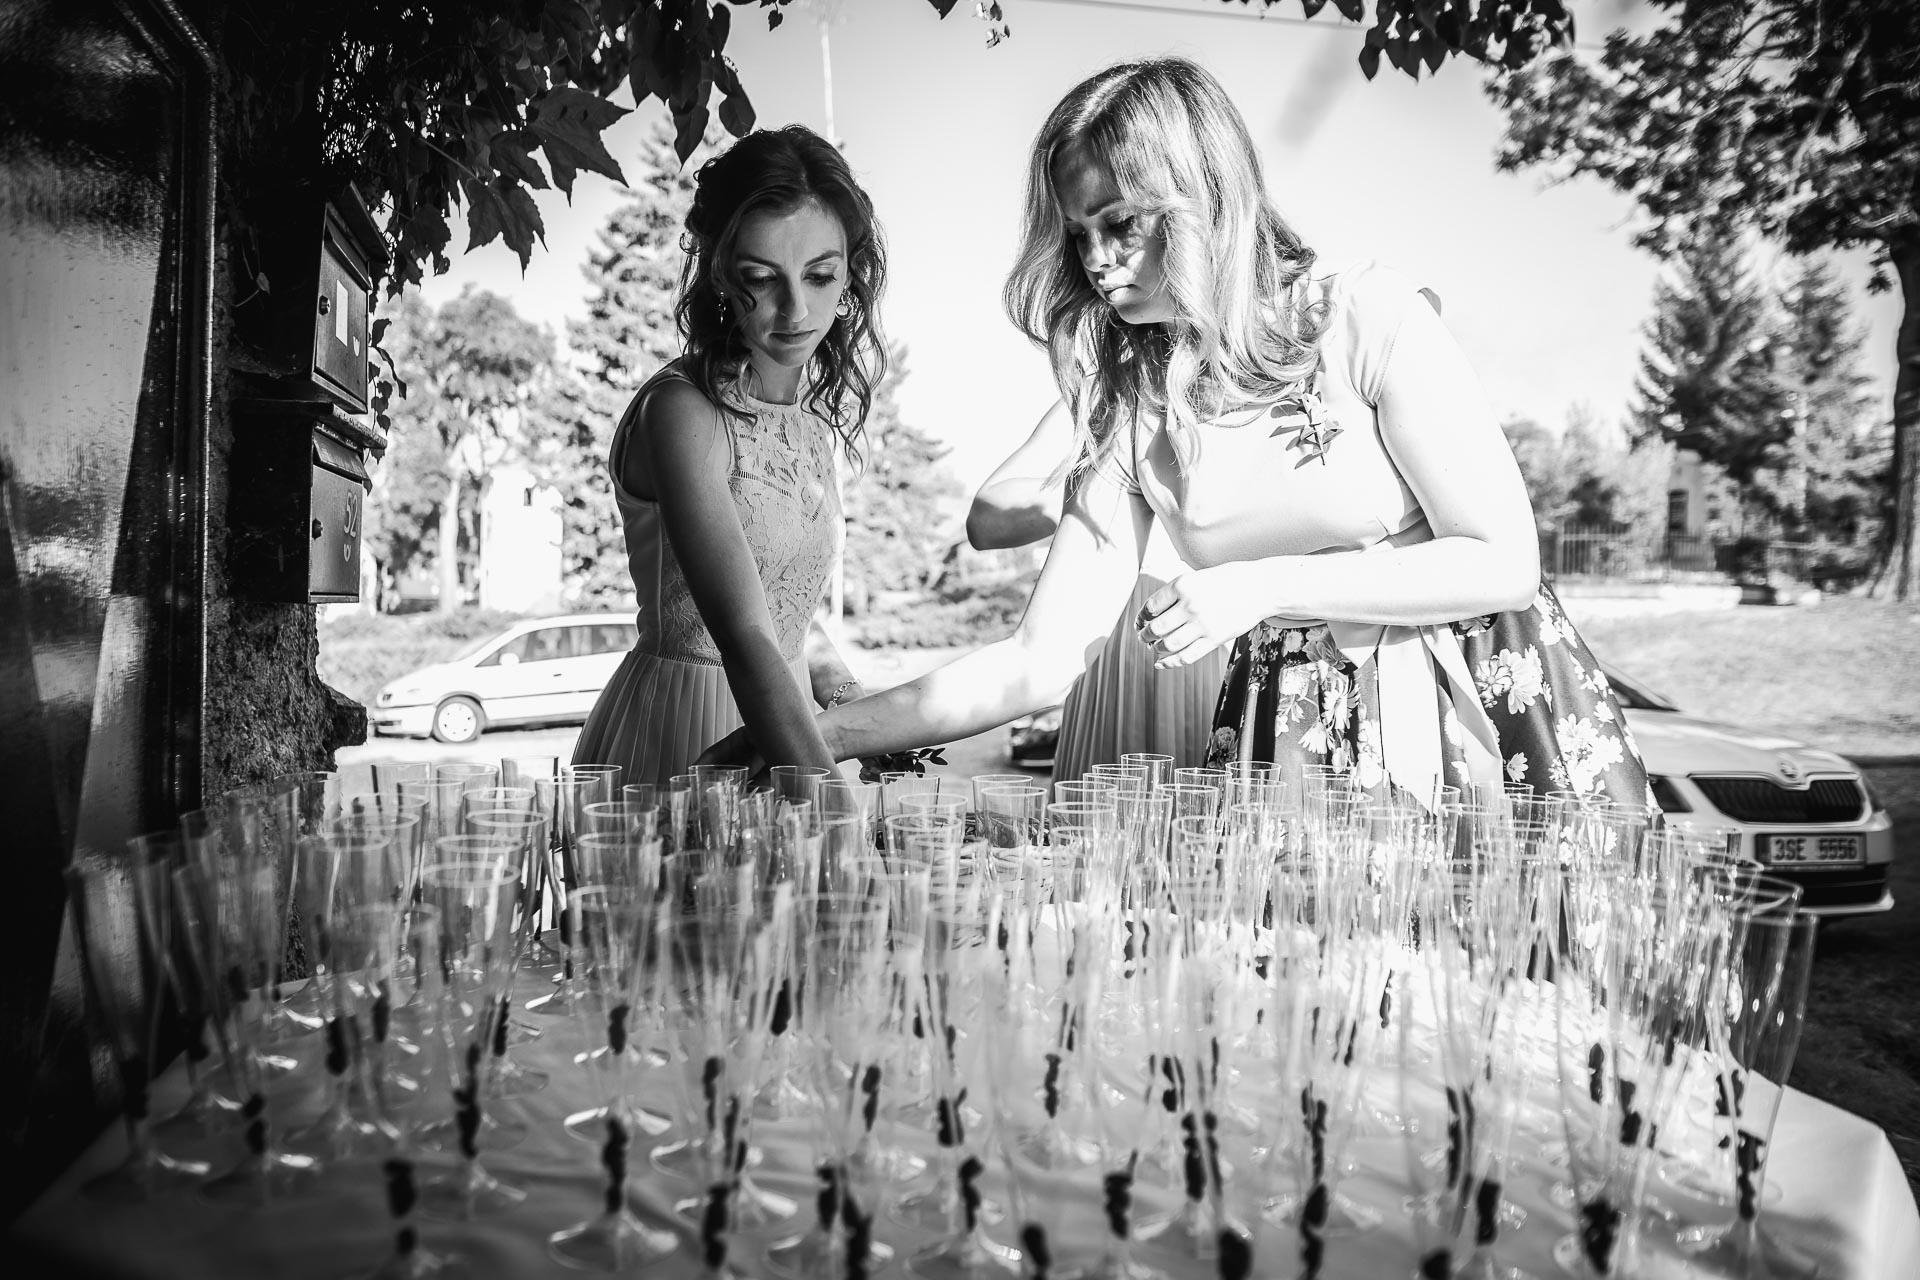 svatební-fotograf-wedding-svatebni-video-orlík-vltava-kostel-statek-stodola-boho-svatba-Beautyfoto-14